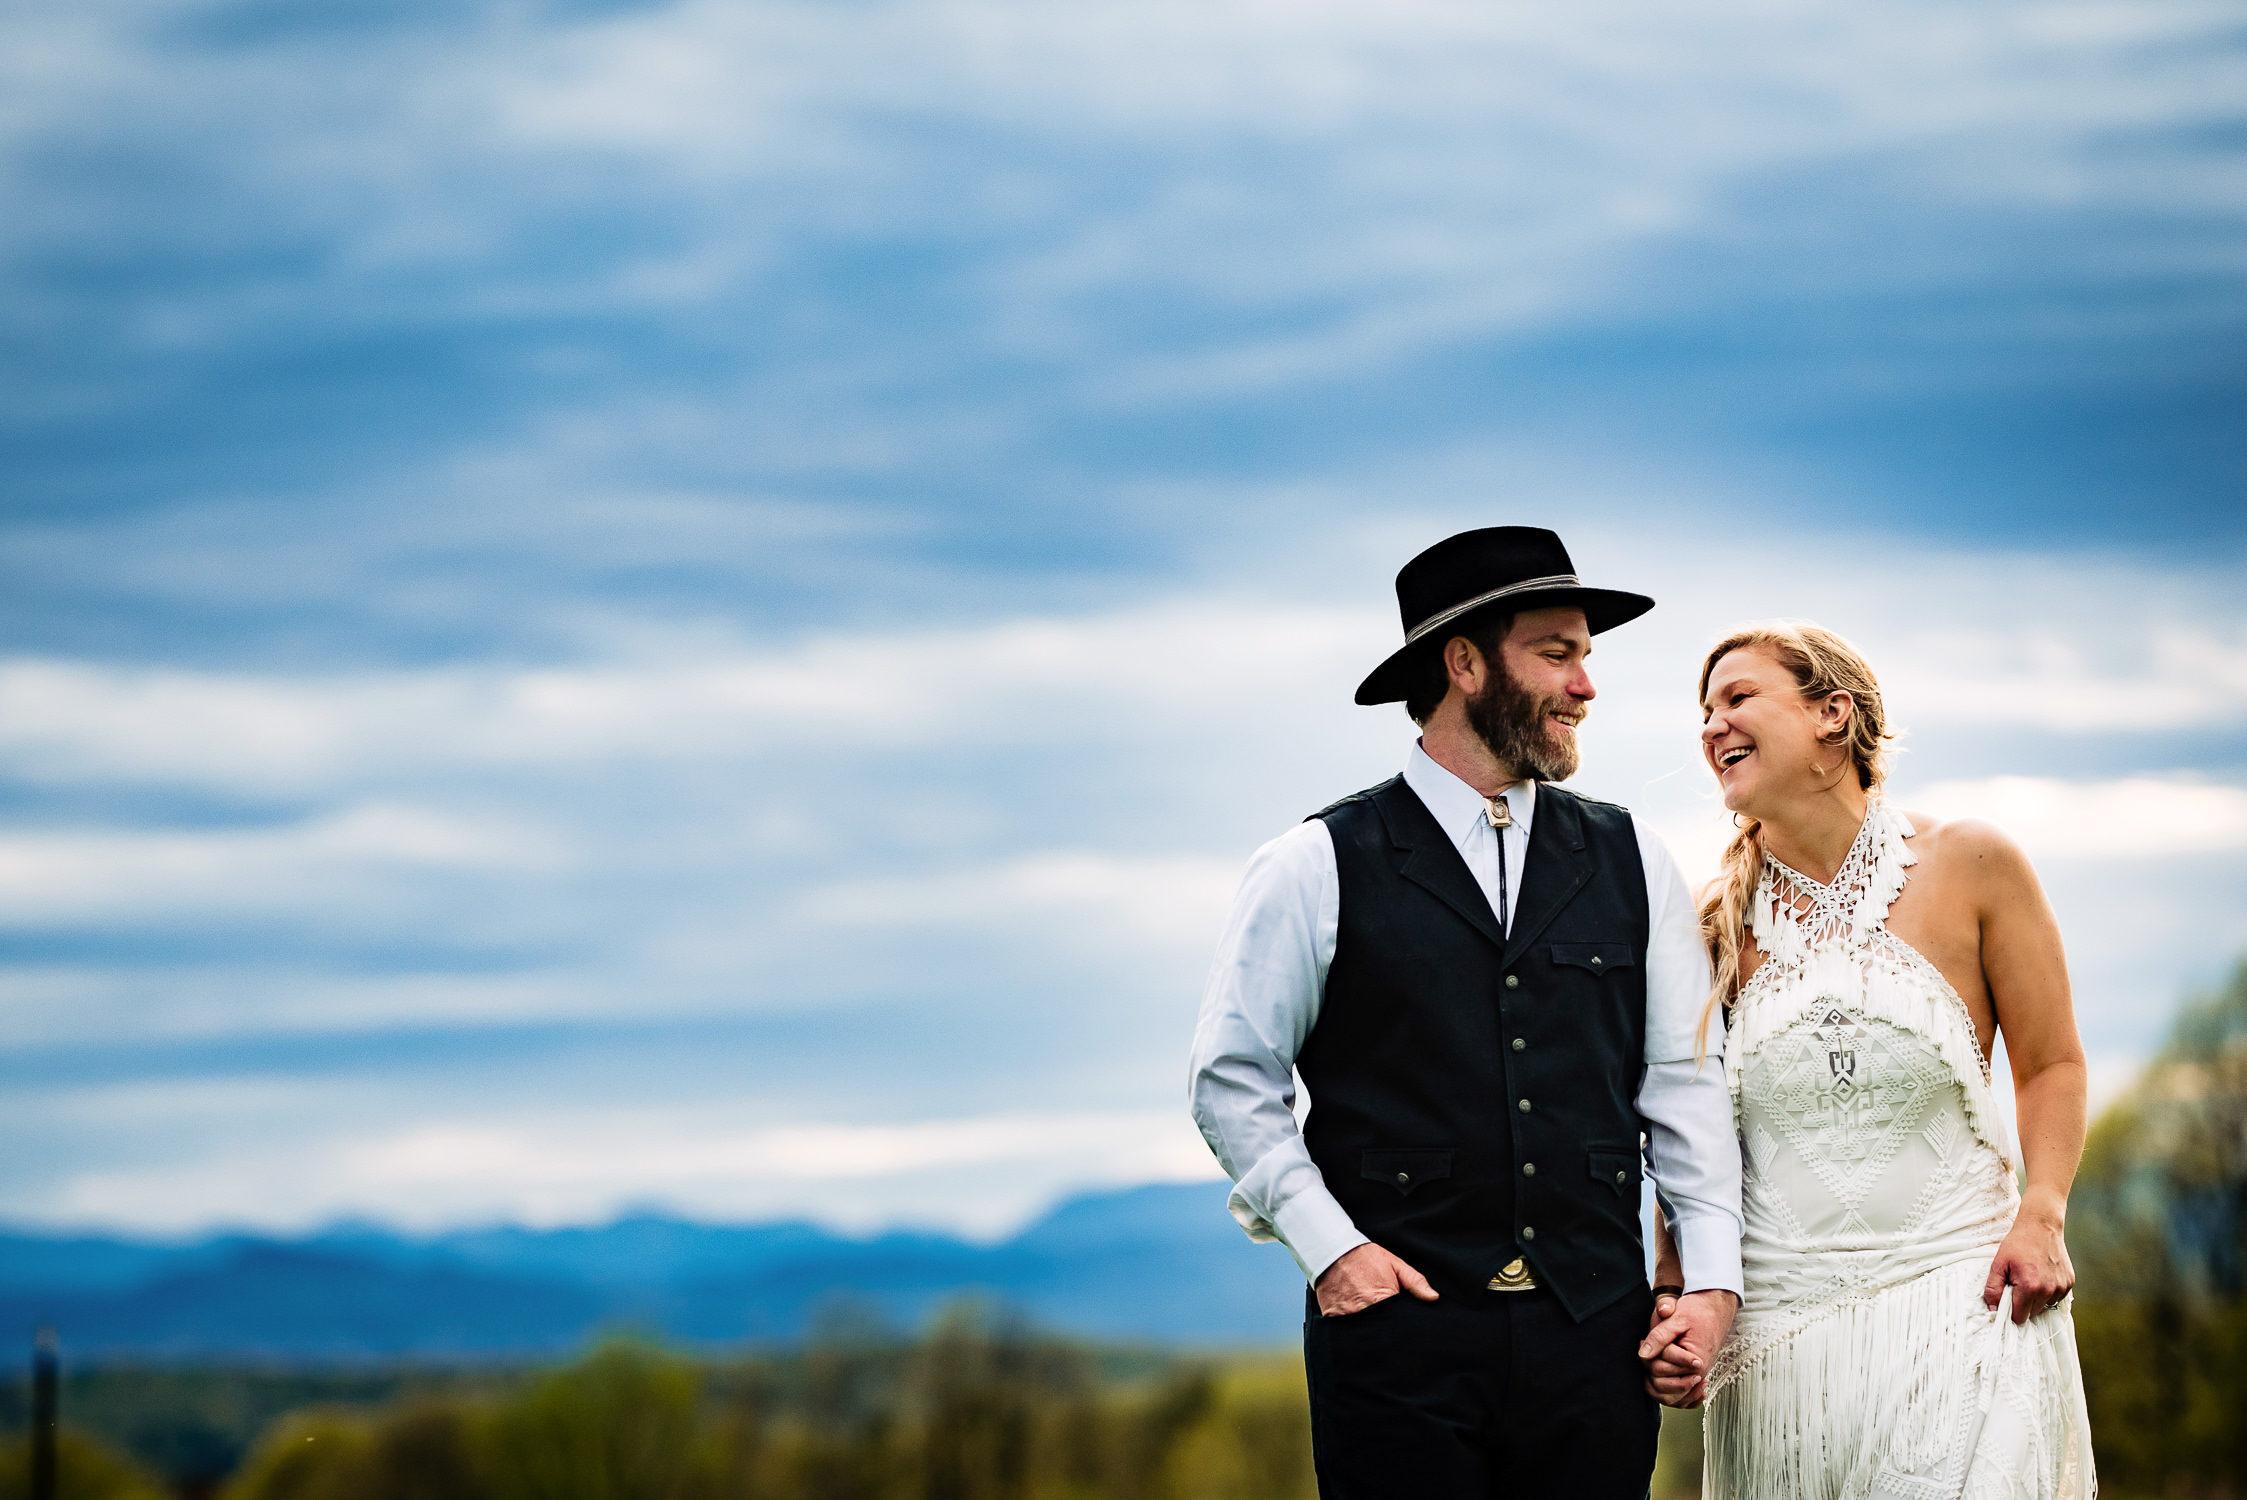 tourterelle-vermont-wedding-photographers-042-2-2247x1500.jpg